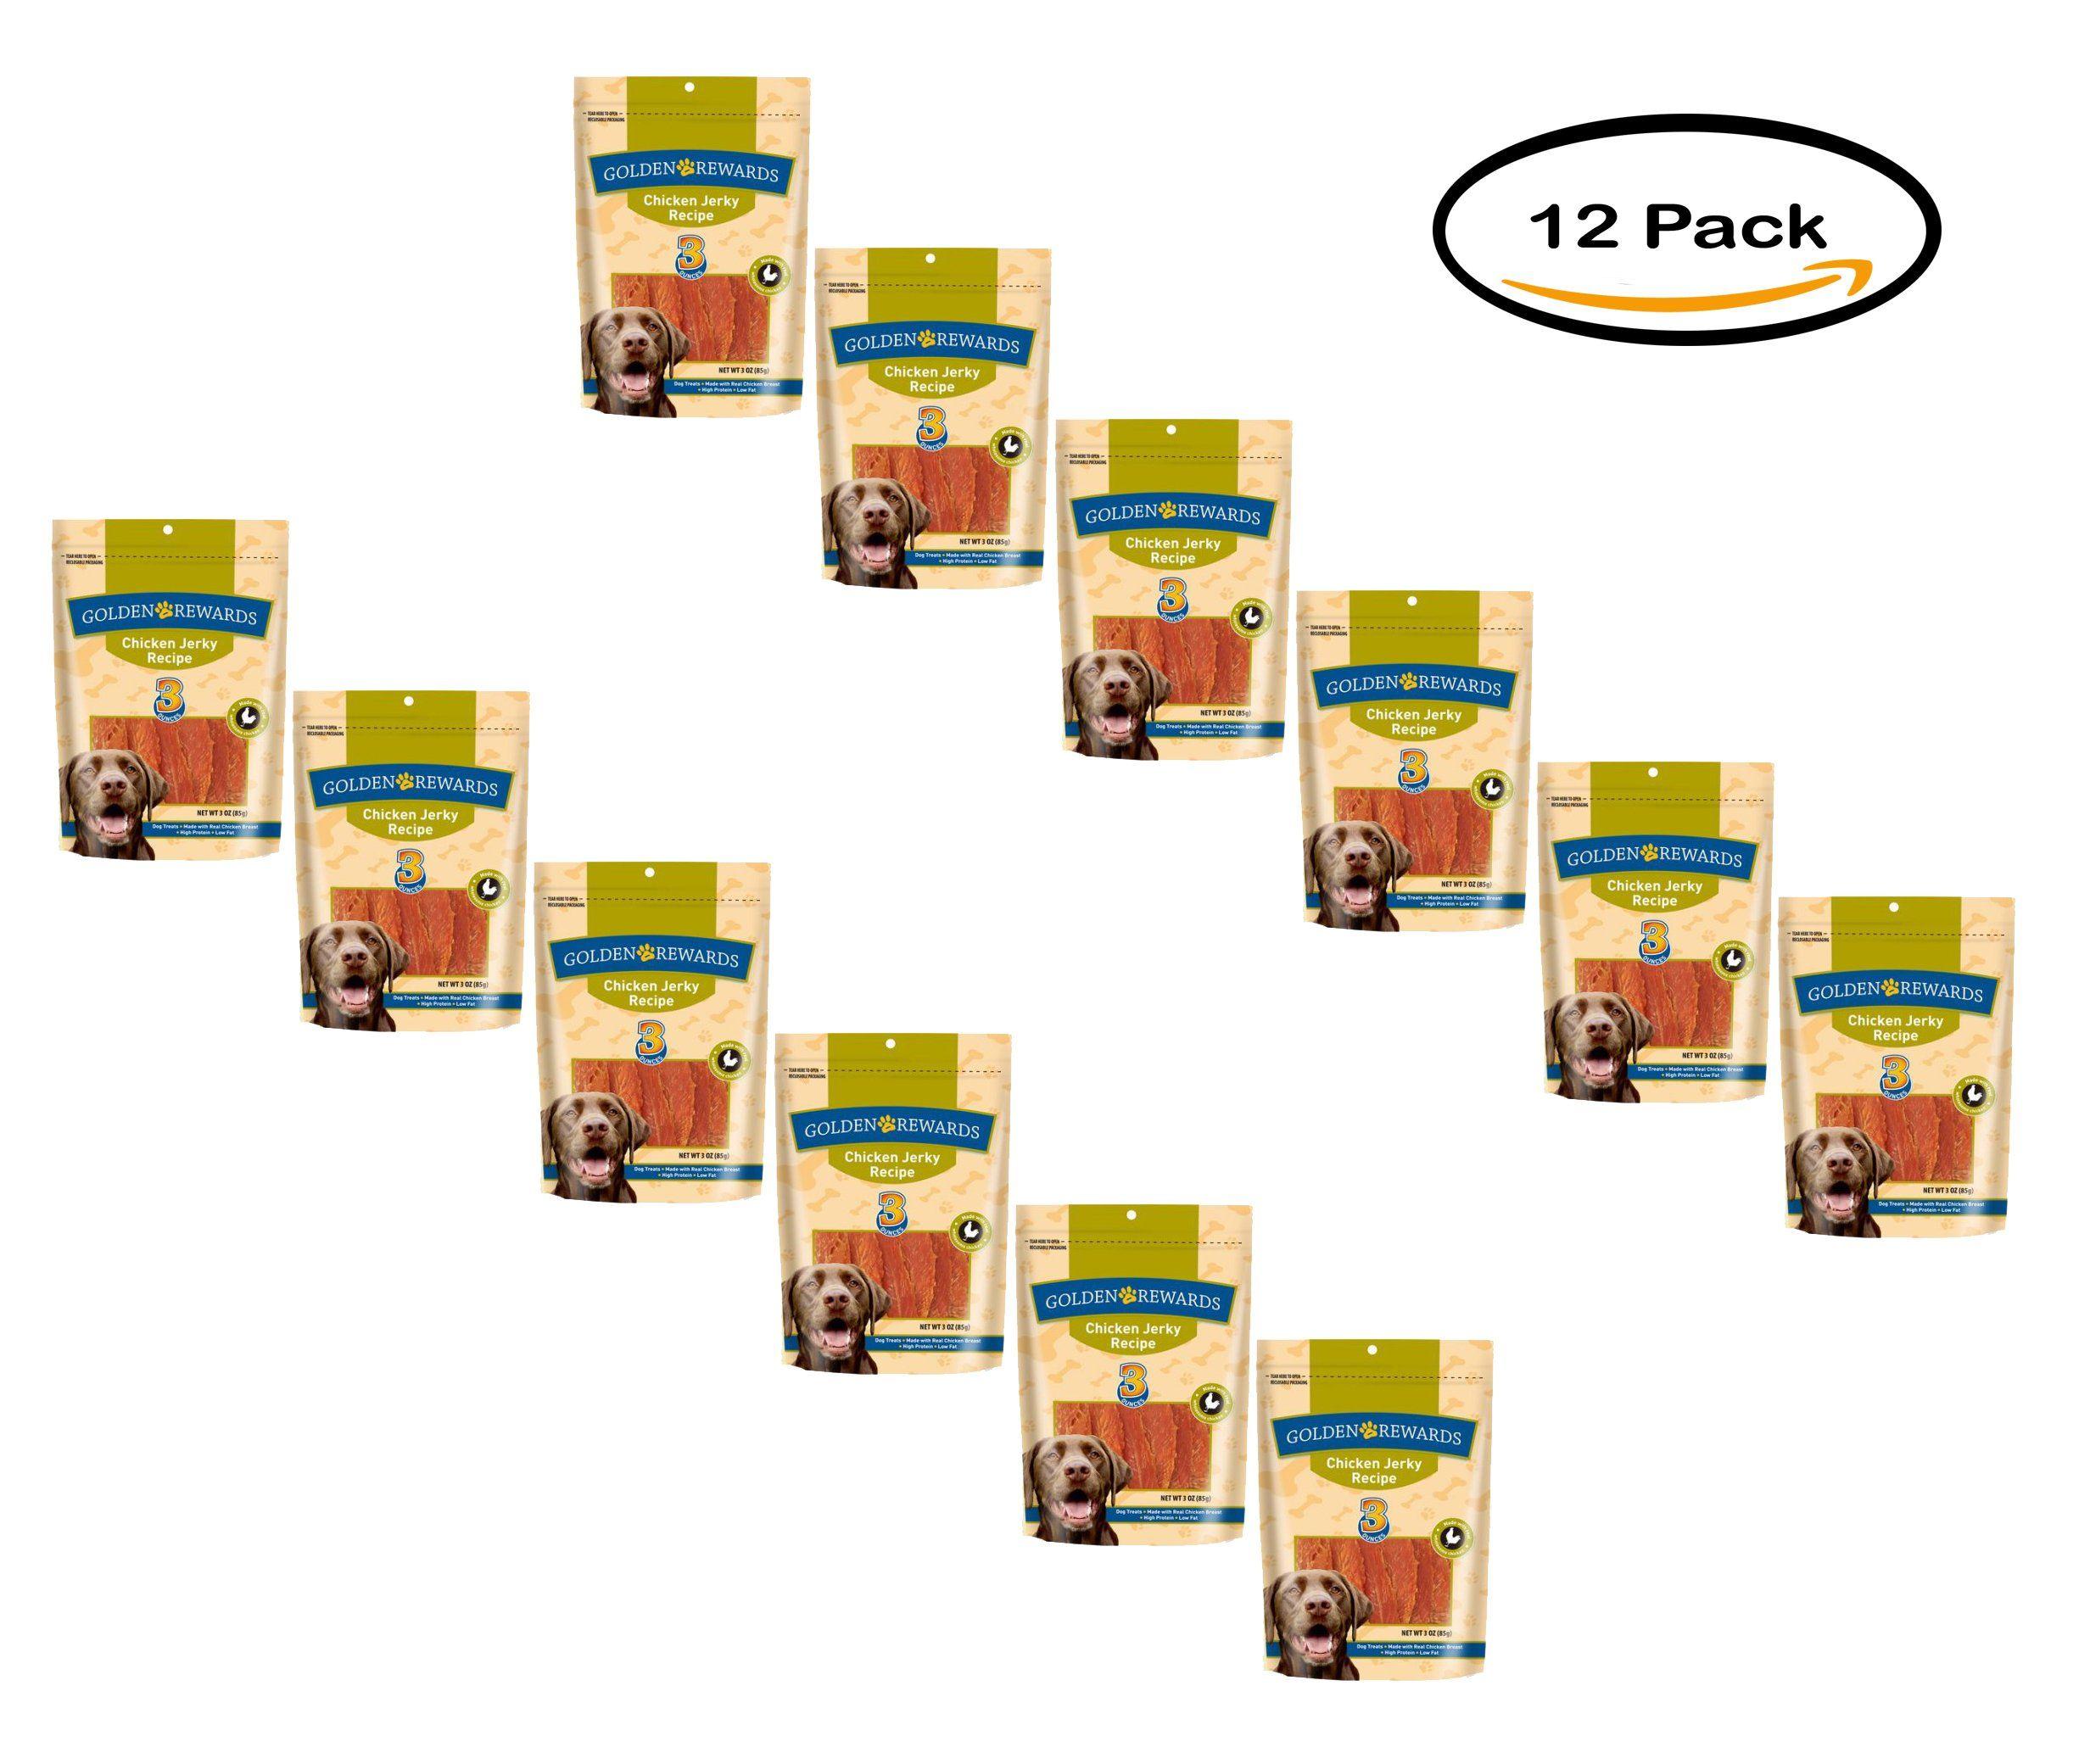 Pack of 12 golden rewards chicken jerky dog treats 3 oz